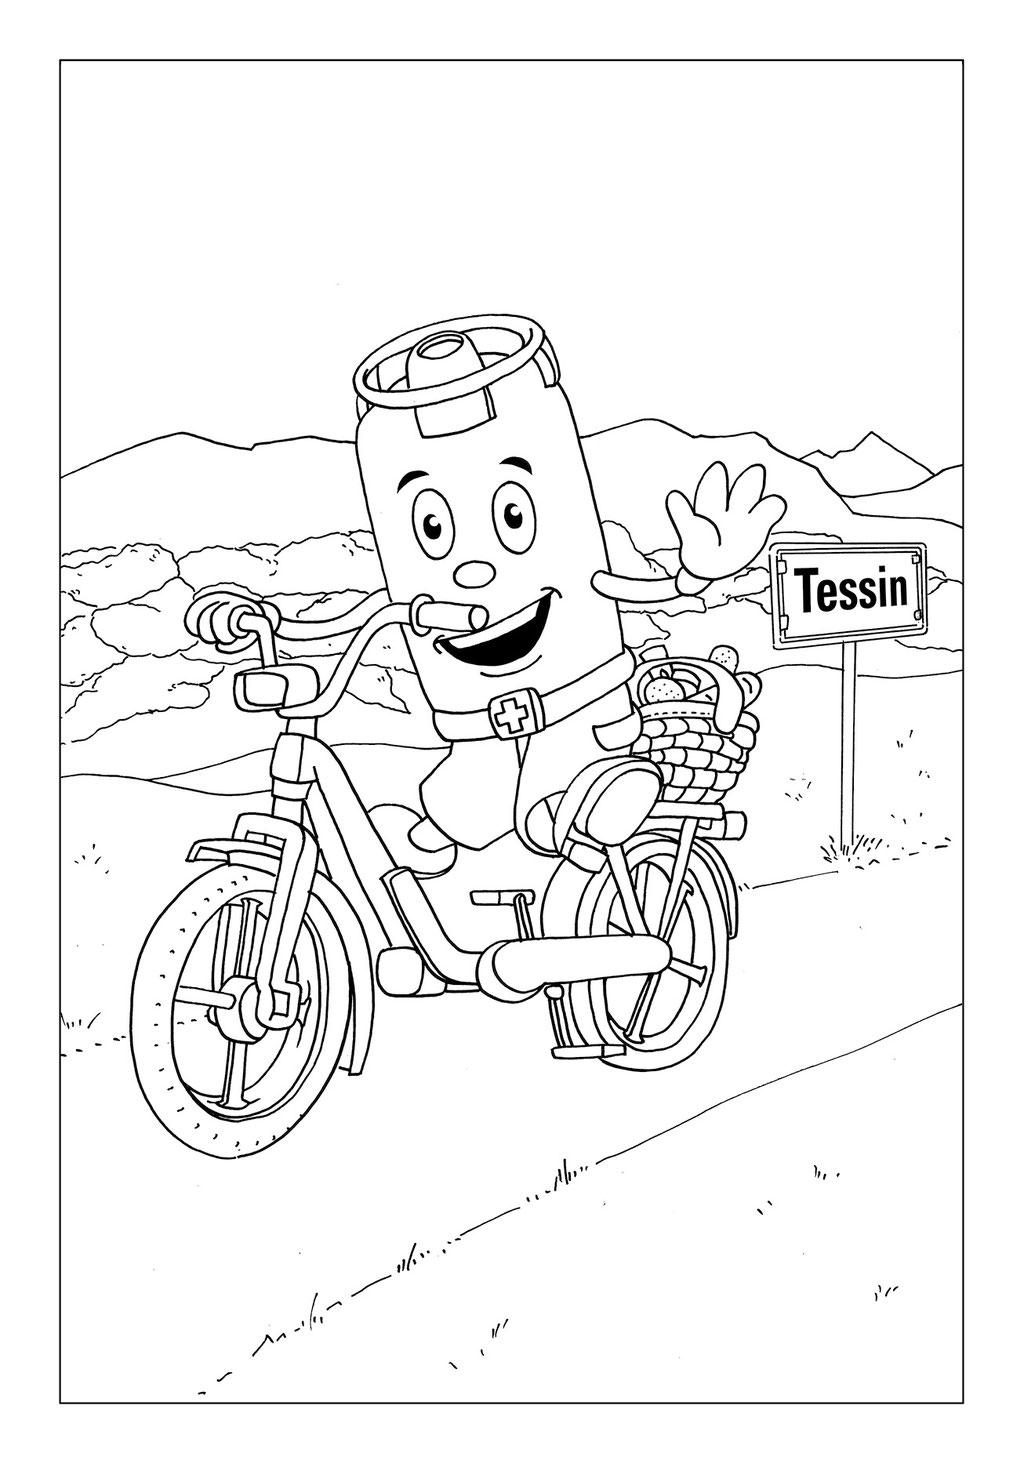 Vitogaz Kinder-Malbuch: Idee Zeichnung und Illustration: auf dem Mofa (Piaggio Ciao) im Tessin